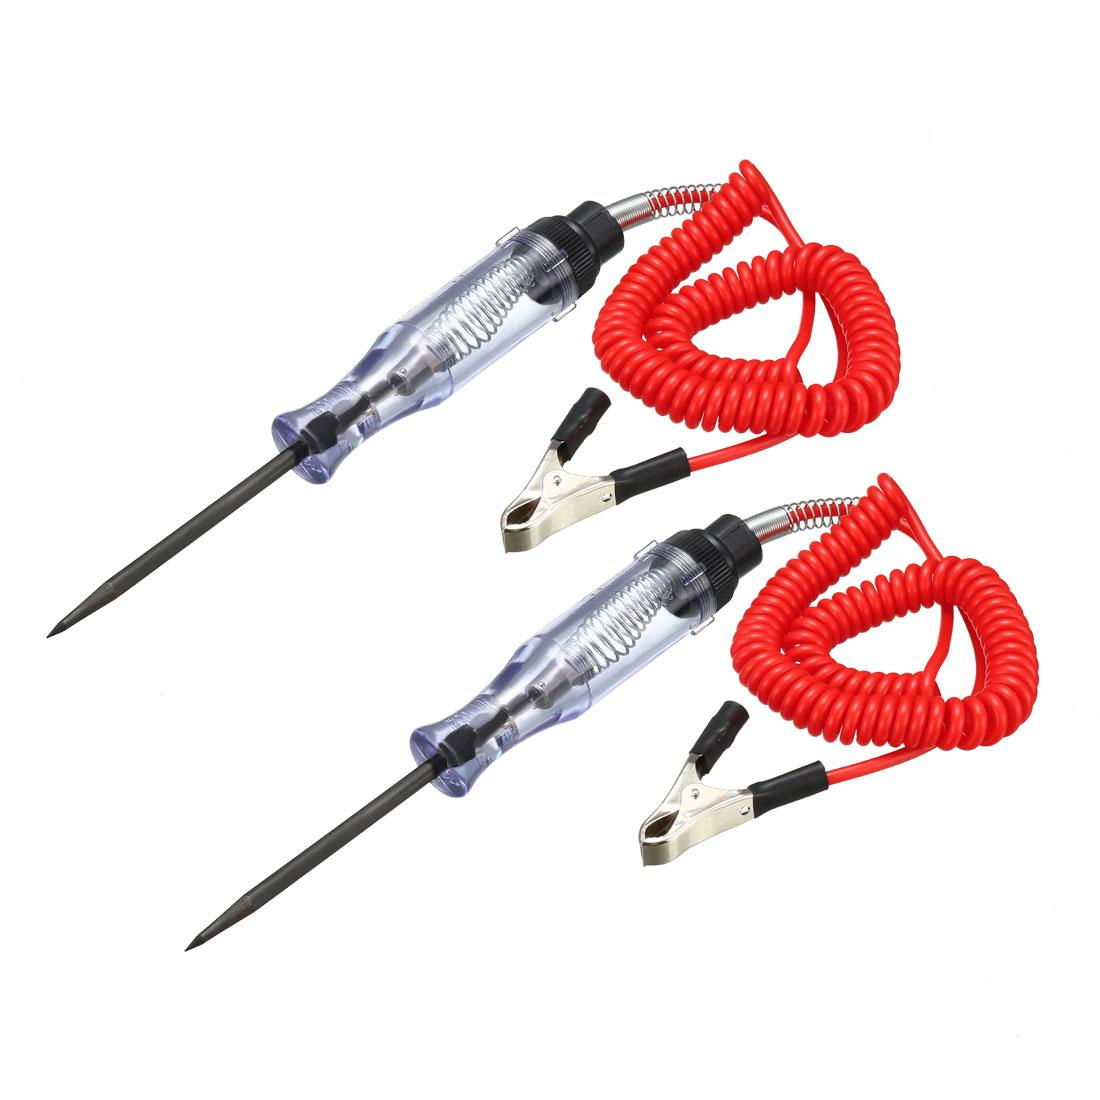 Car Voltage Tester, Auto Heavy-Duty Contact Volt Circuit Test Pen DC6V 12V 2pcs